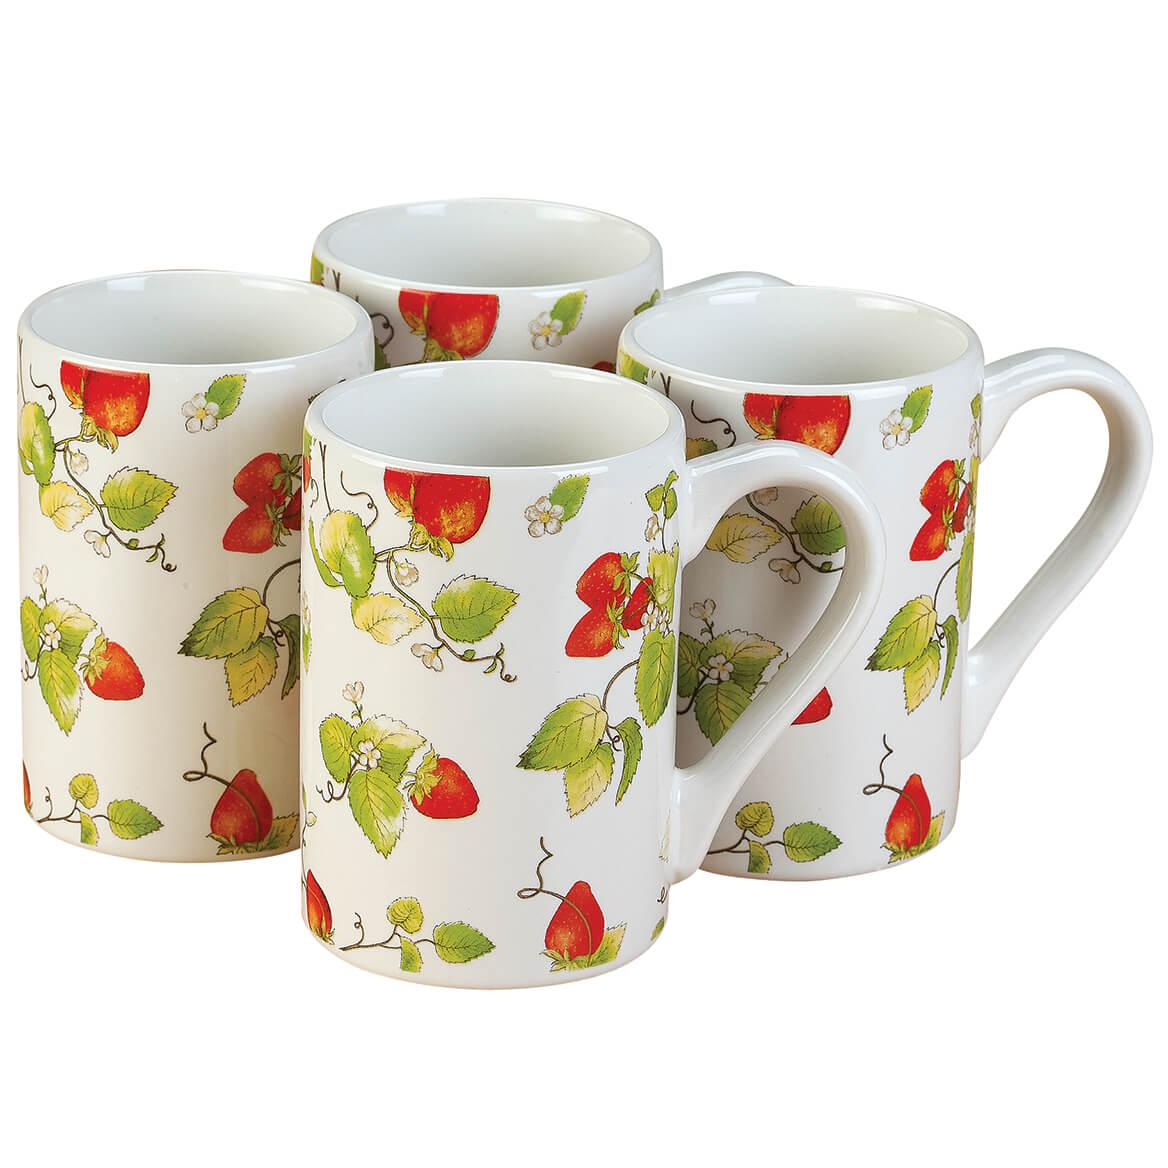 Strawberry Chintz Mugs set of 4 by William Roberts-369000